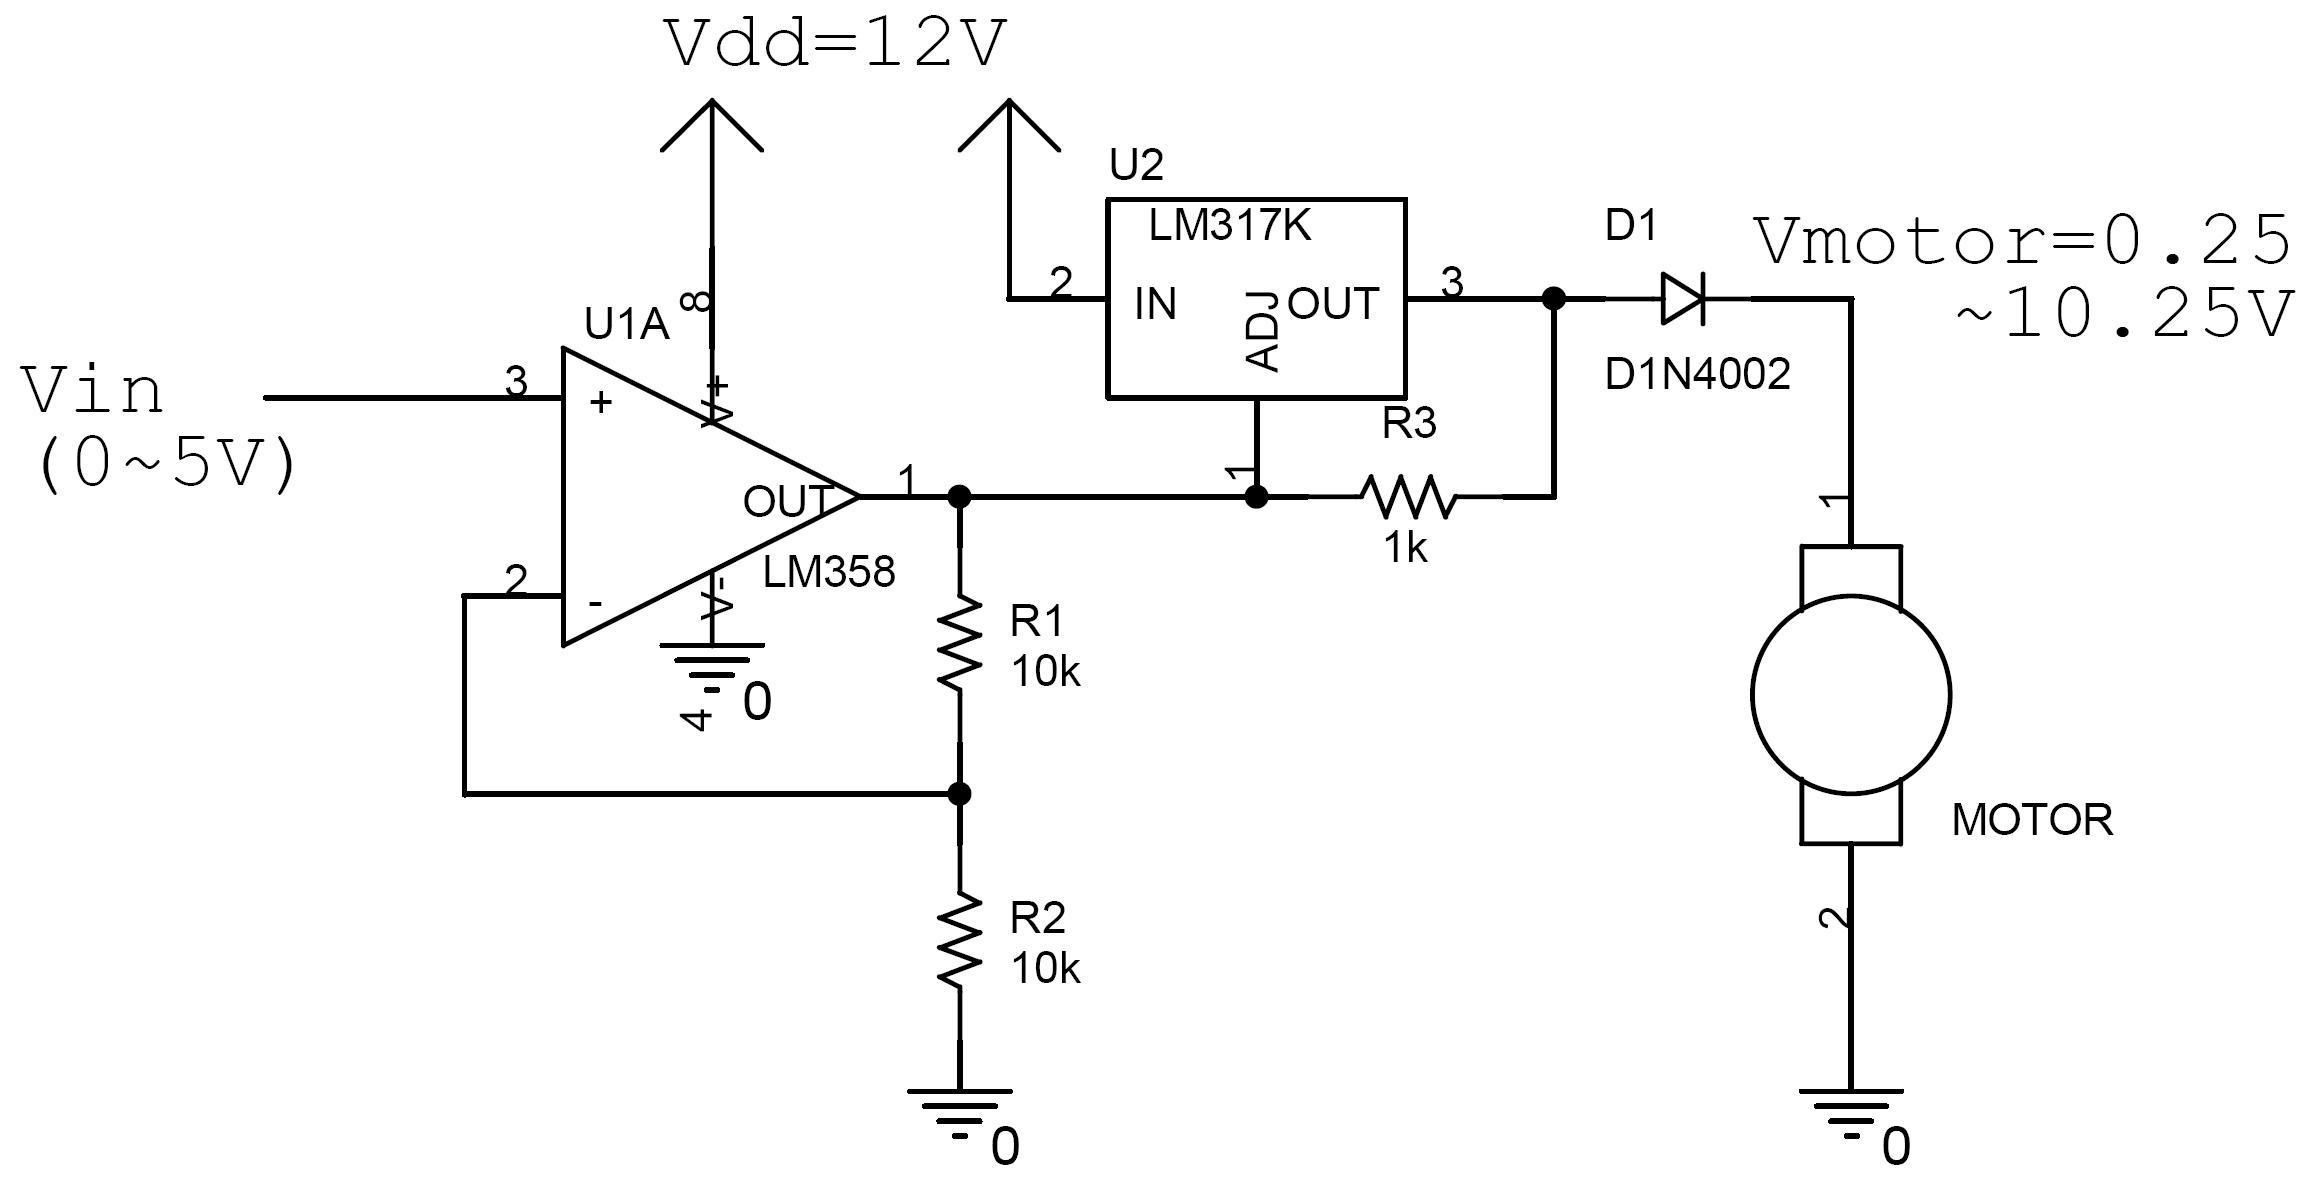 ac motor speed controller circuit diagram gooseneck stock trailer wiring schematic lm317 43 lm358